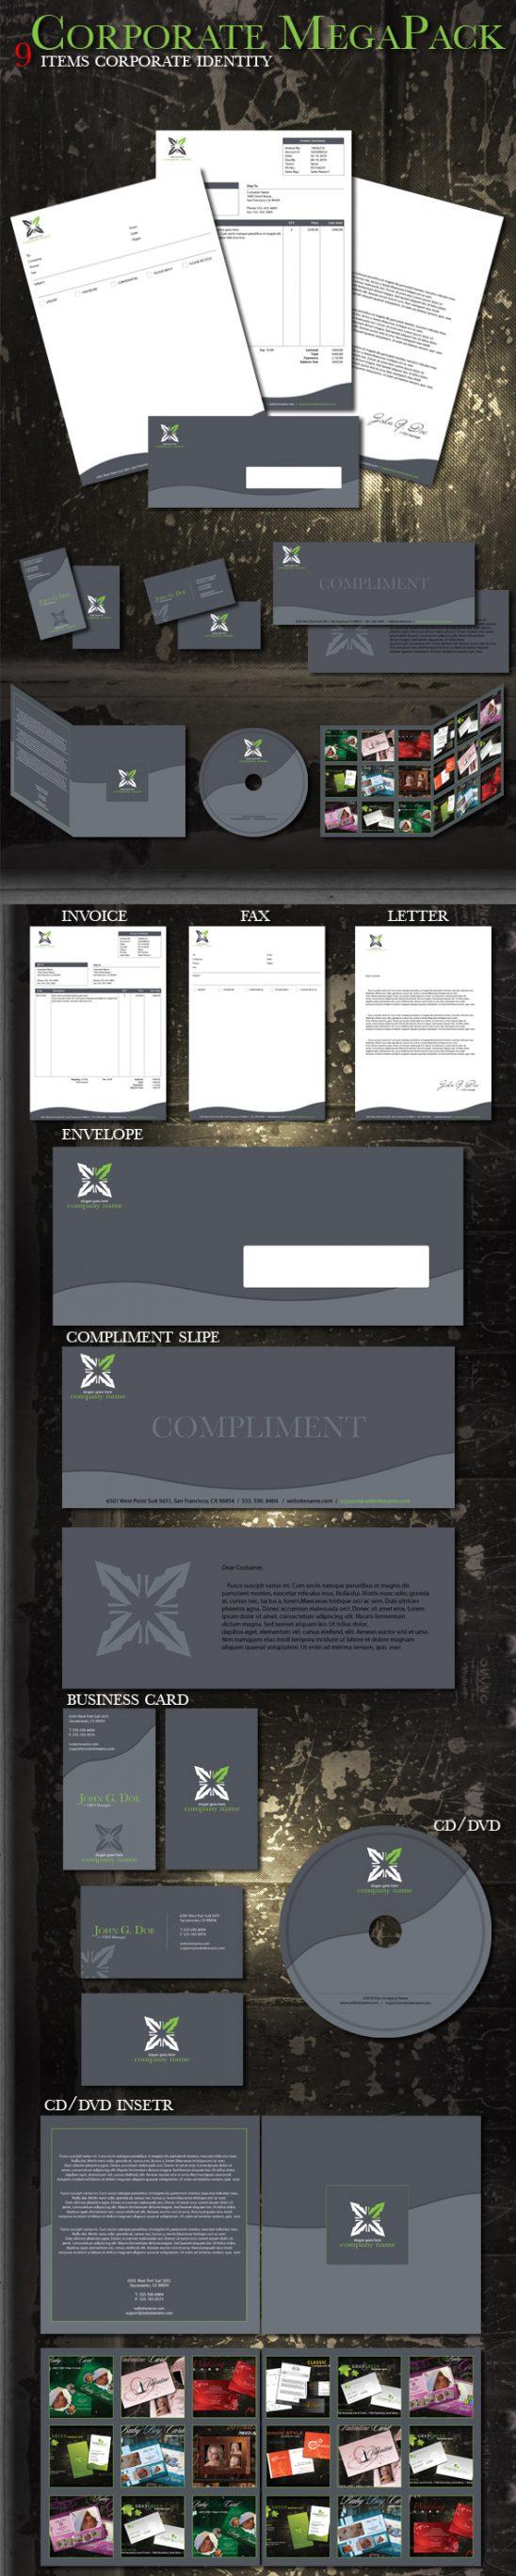 p235 548x2738 - لایه باز ست اداری کامل تجاری و رسمی